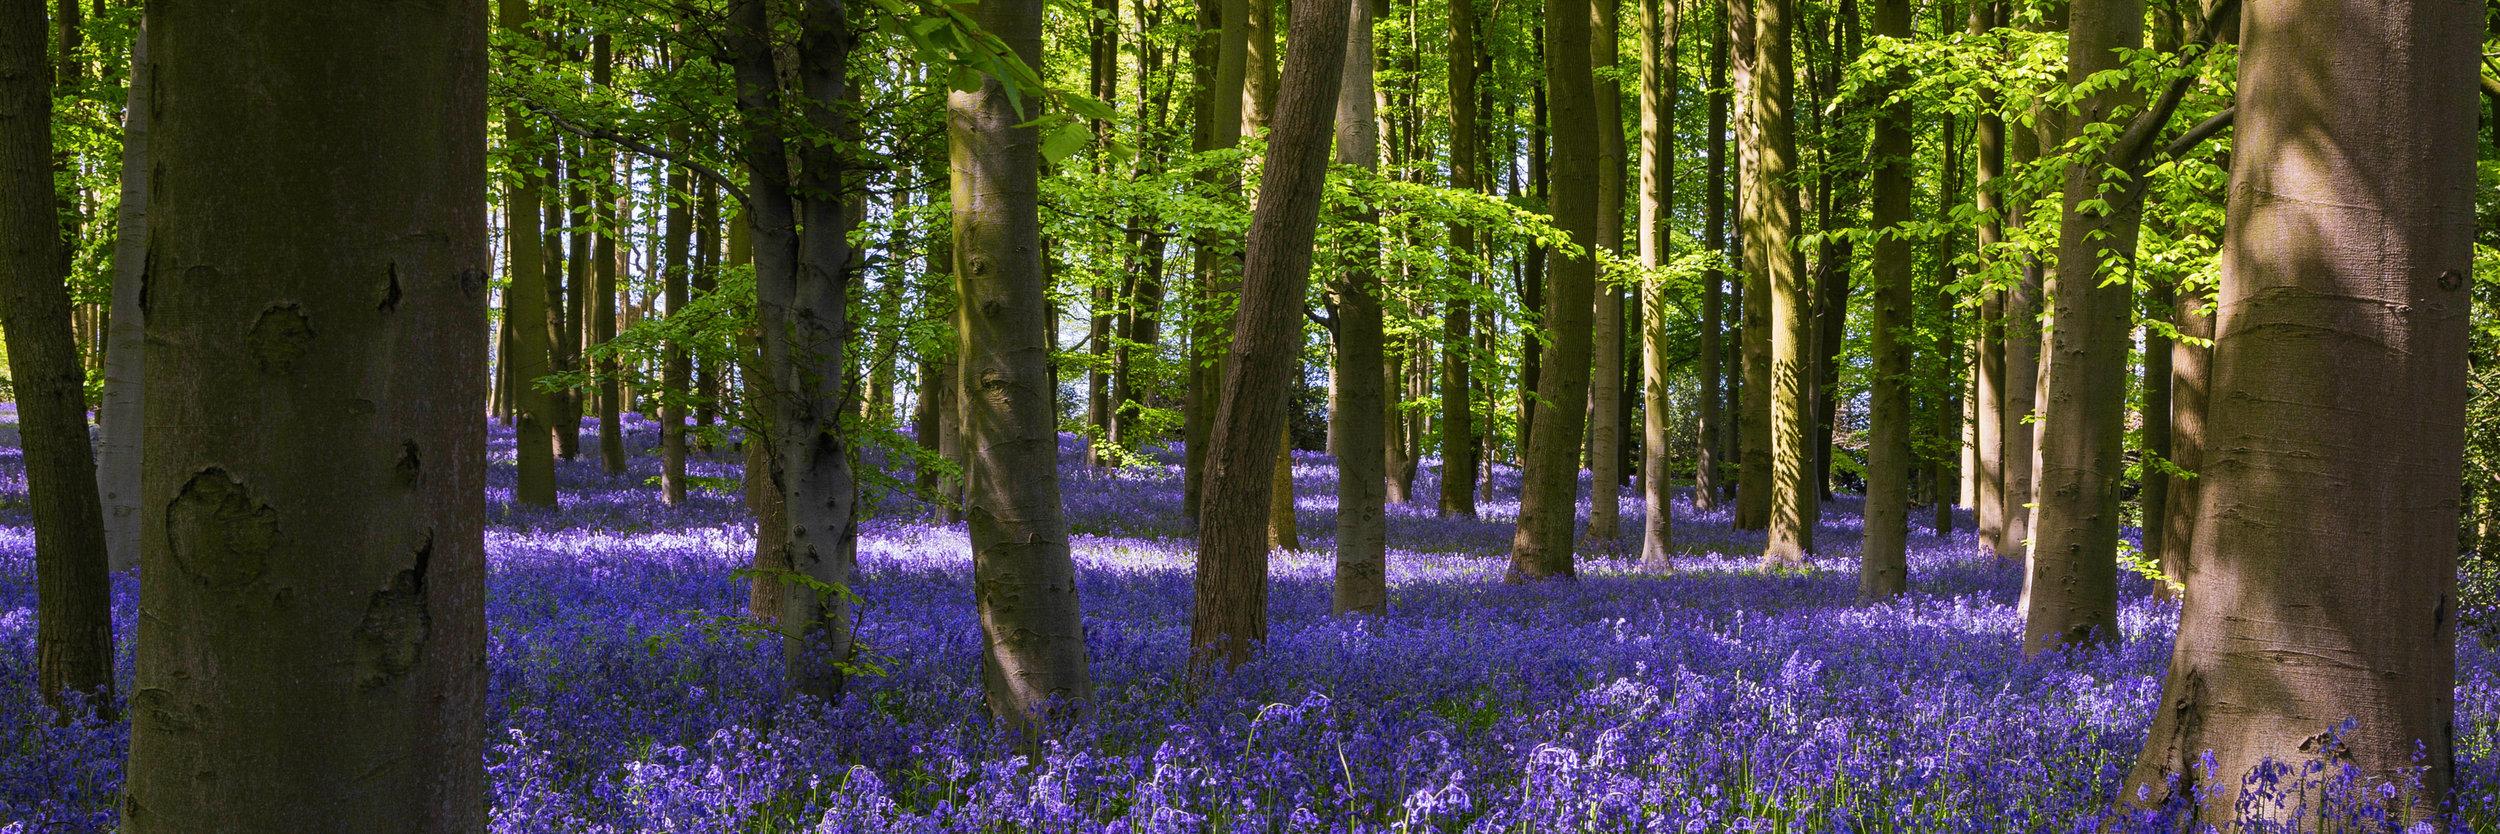 Indigo carpet of bluebells amongst the beech trees in Coton Manor, Northamptonshire.Image:   Chris Denning, Verve Garden Design